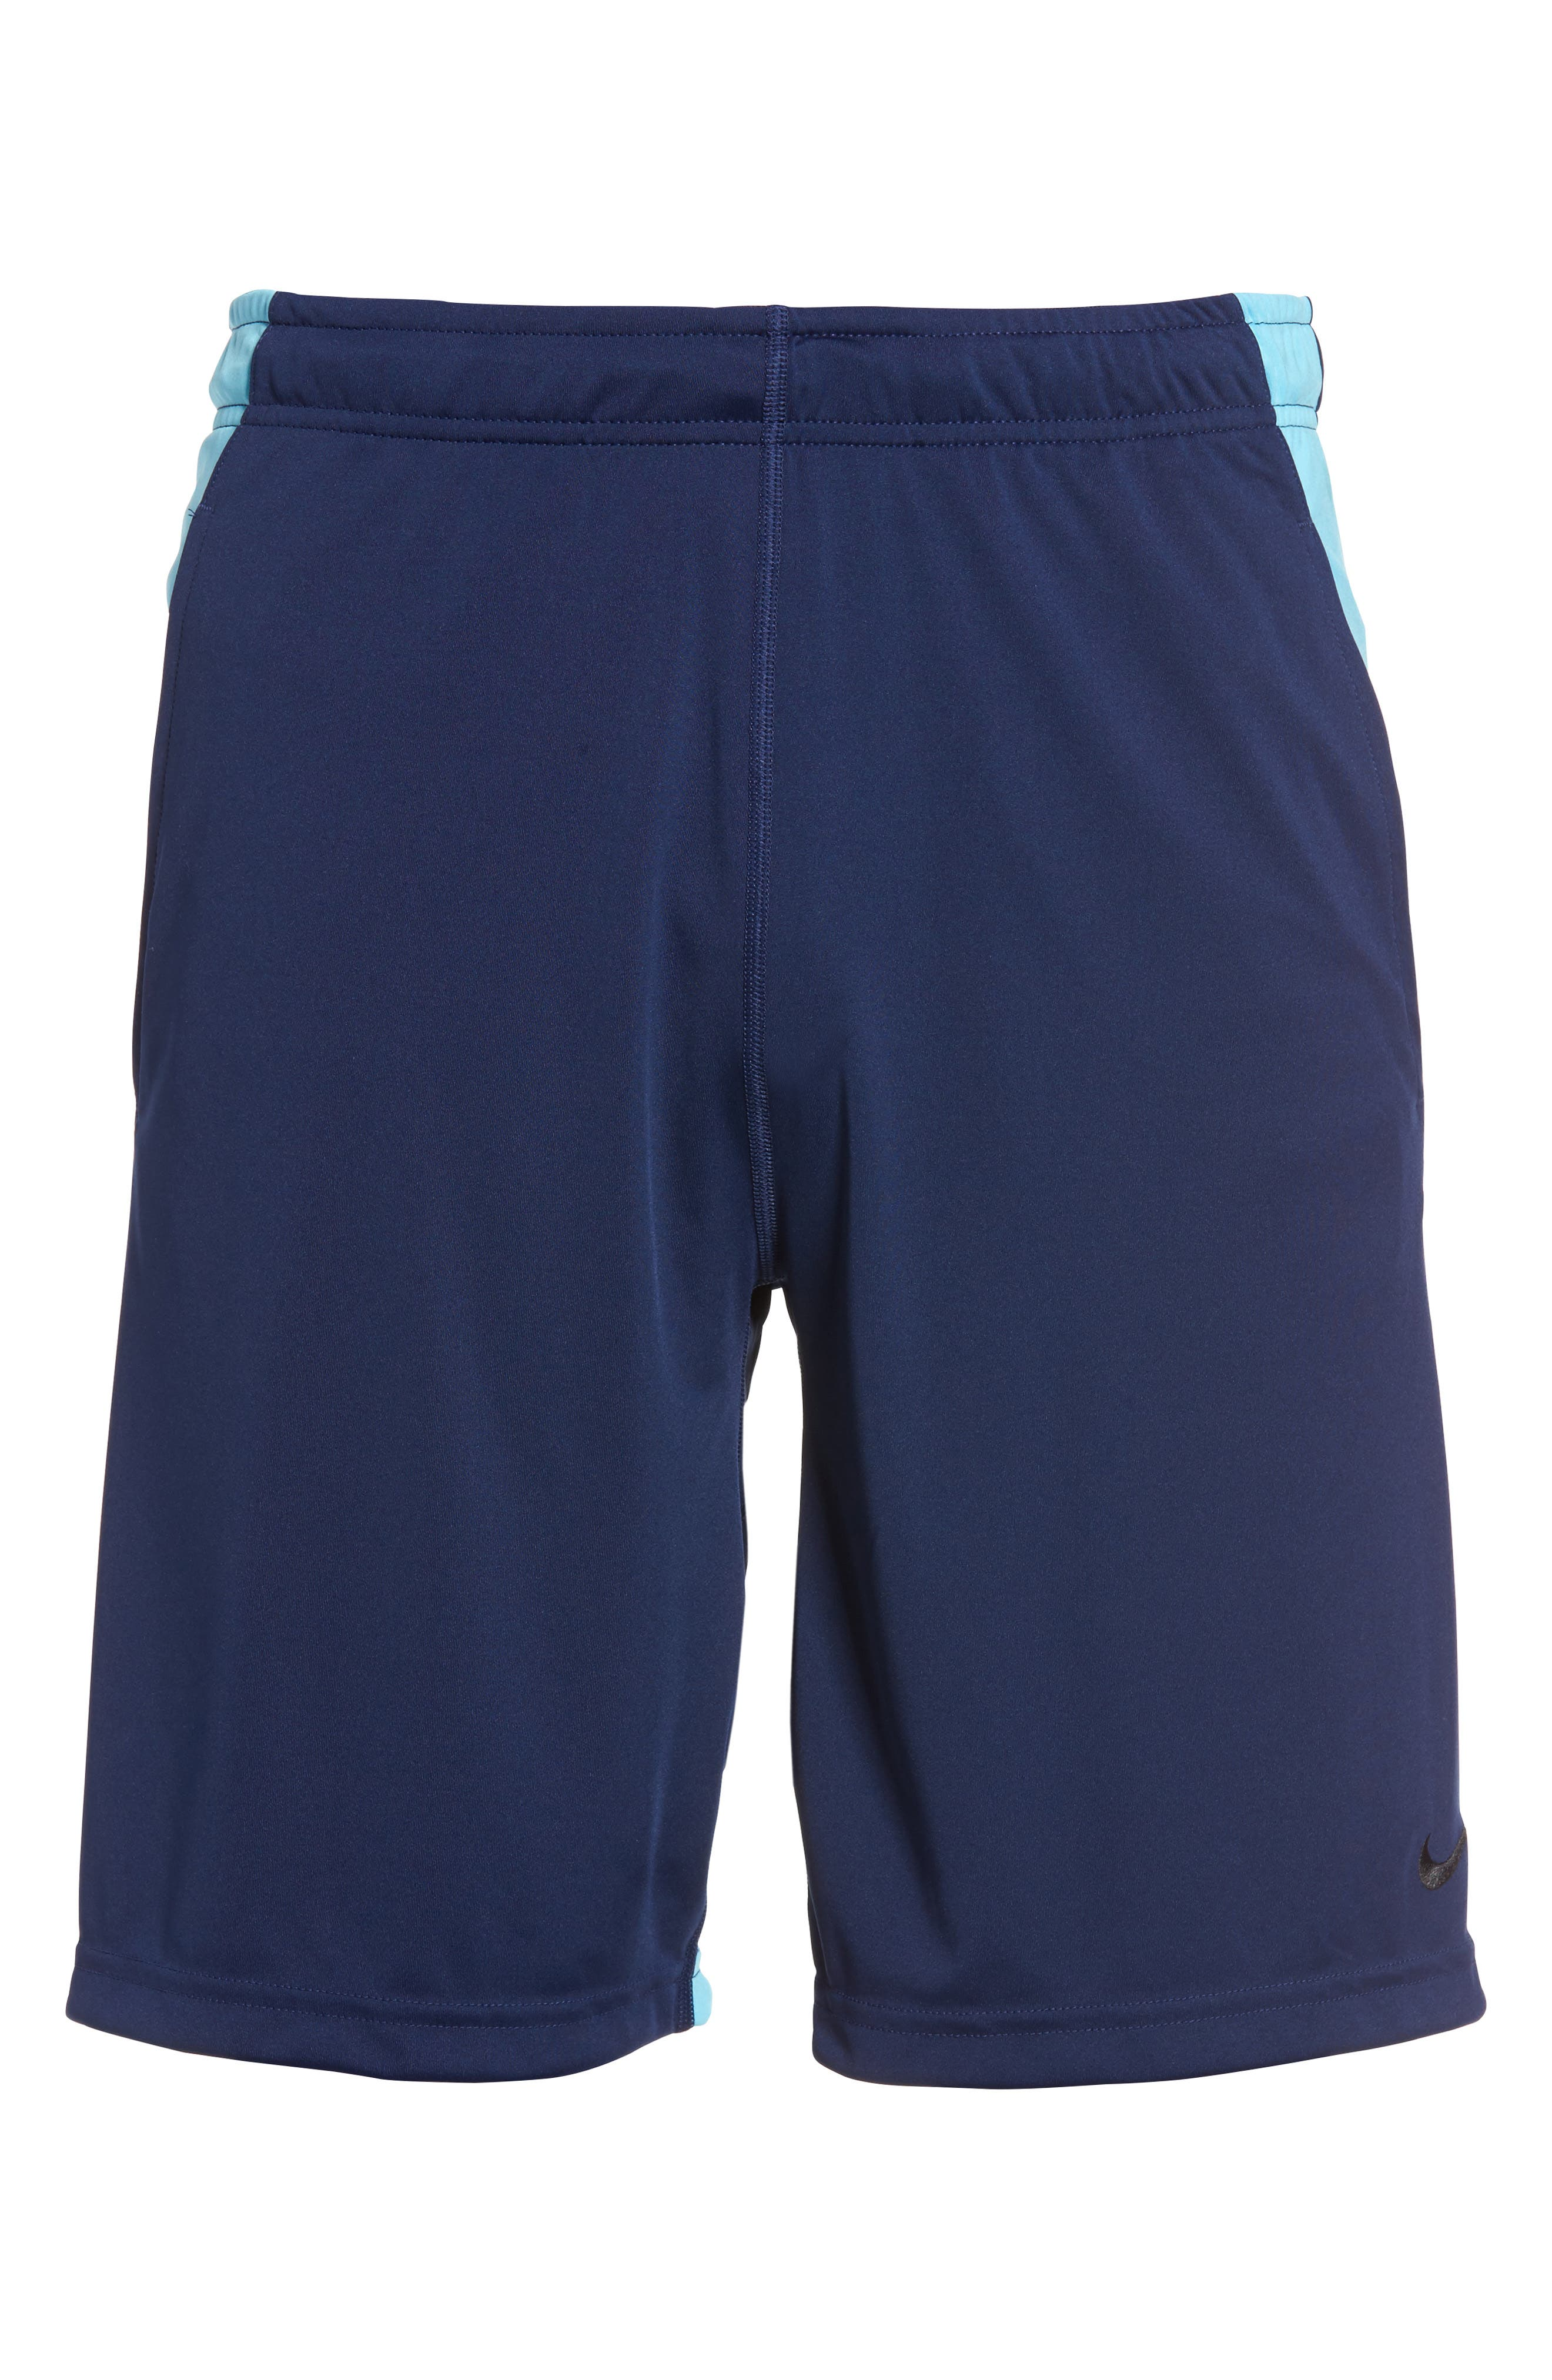 'Fly' Dri-FIT Training Shorts,                             Alternate thumbnail 2, color,                             Binary Blue/ Vivid Sky